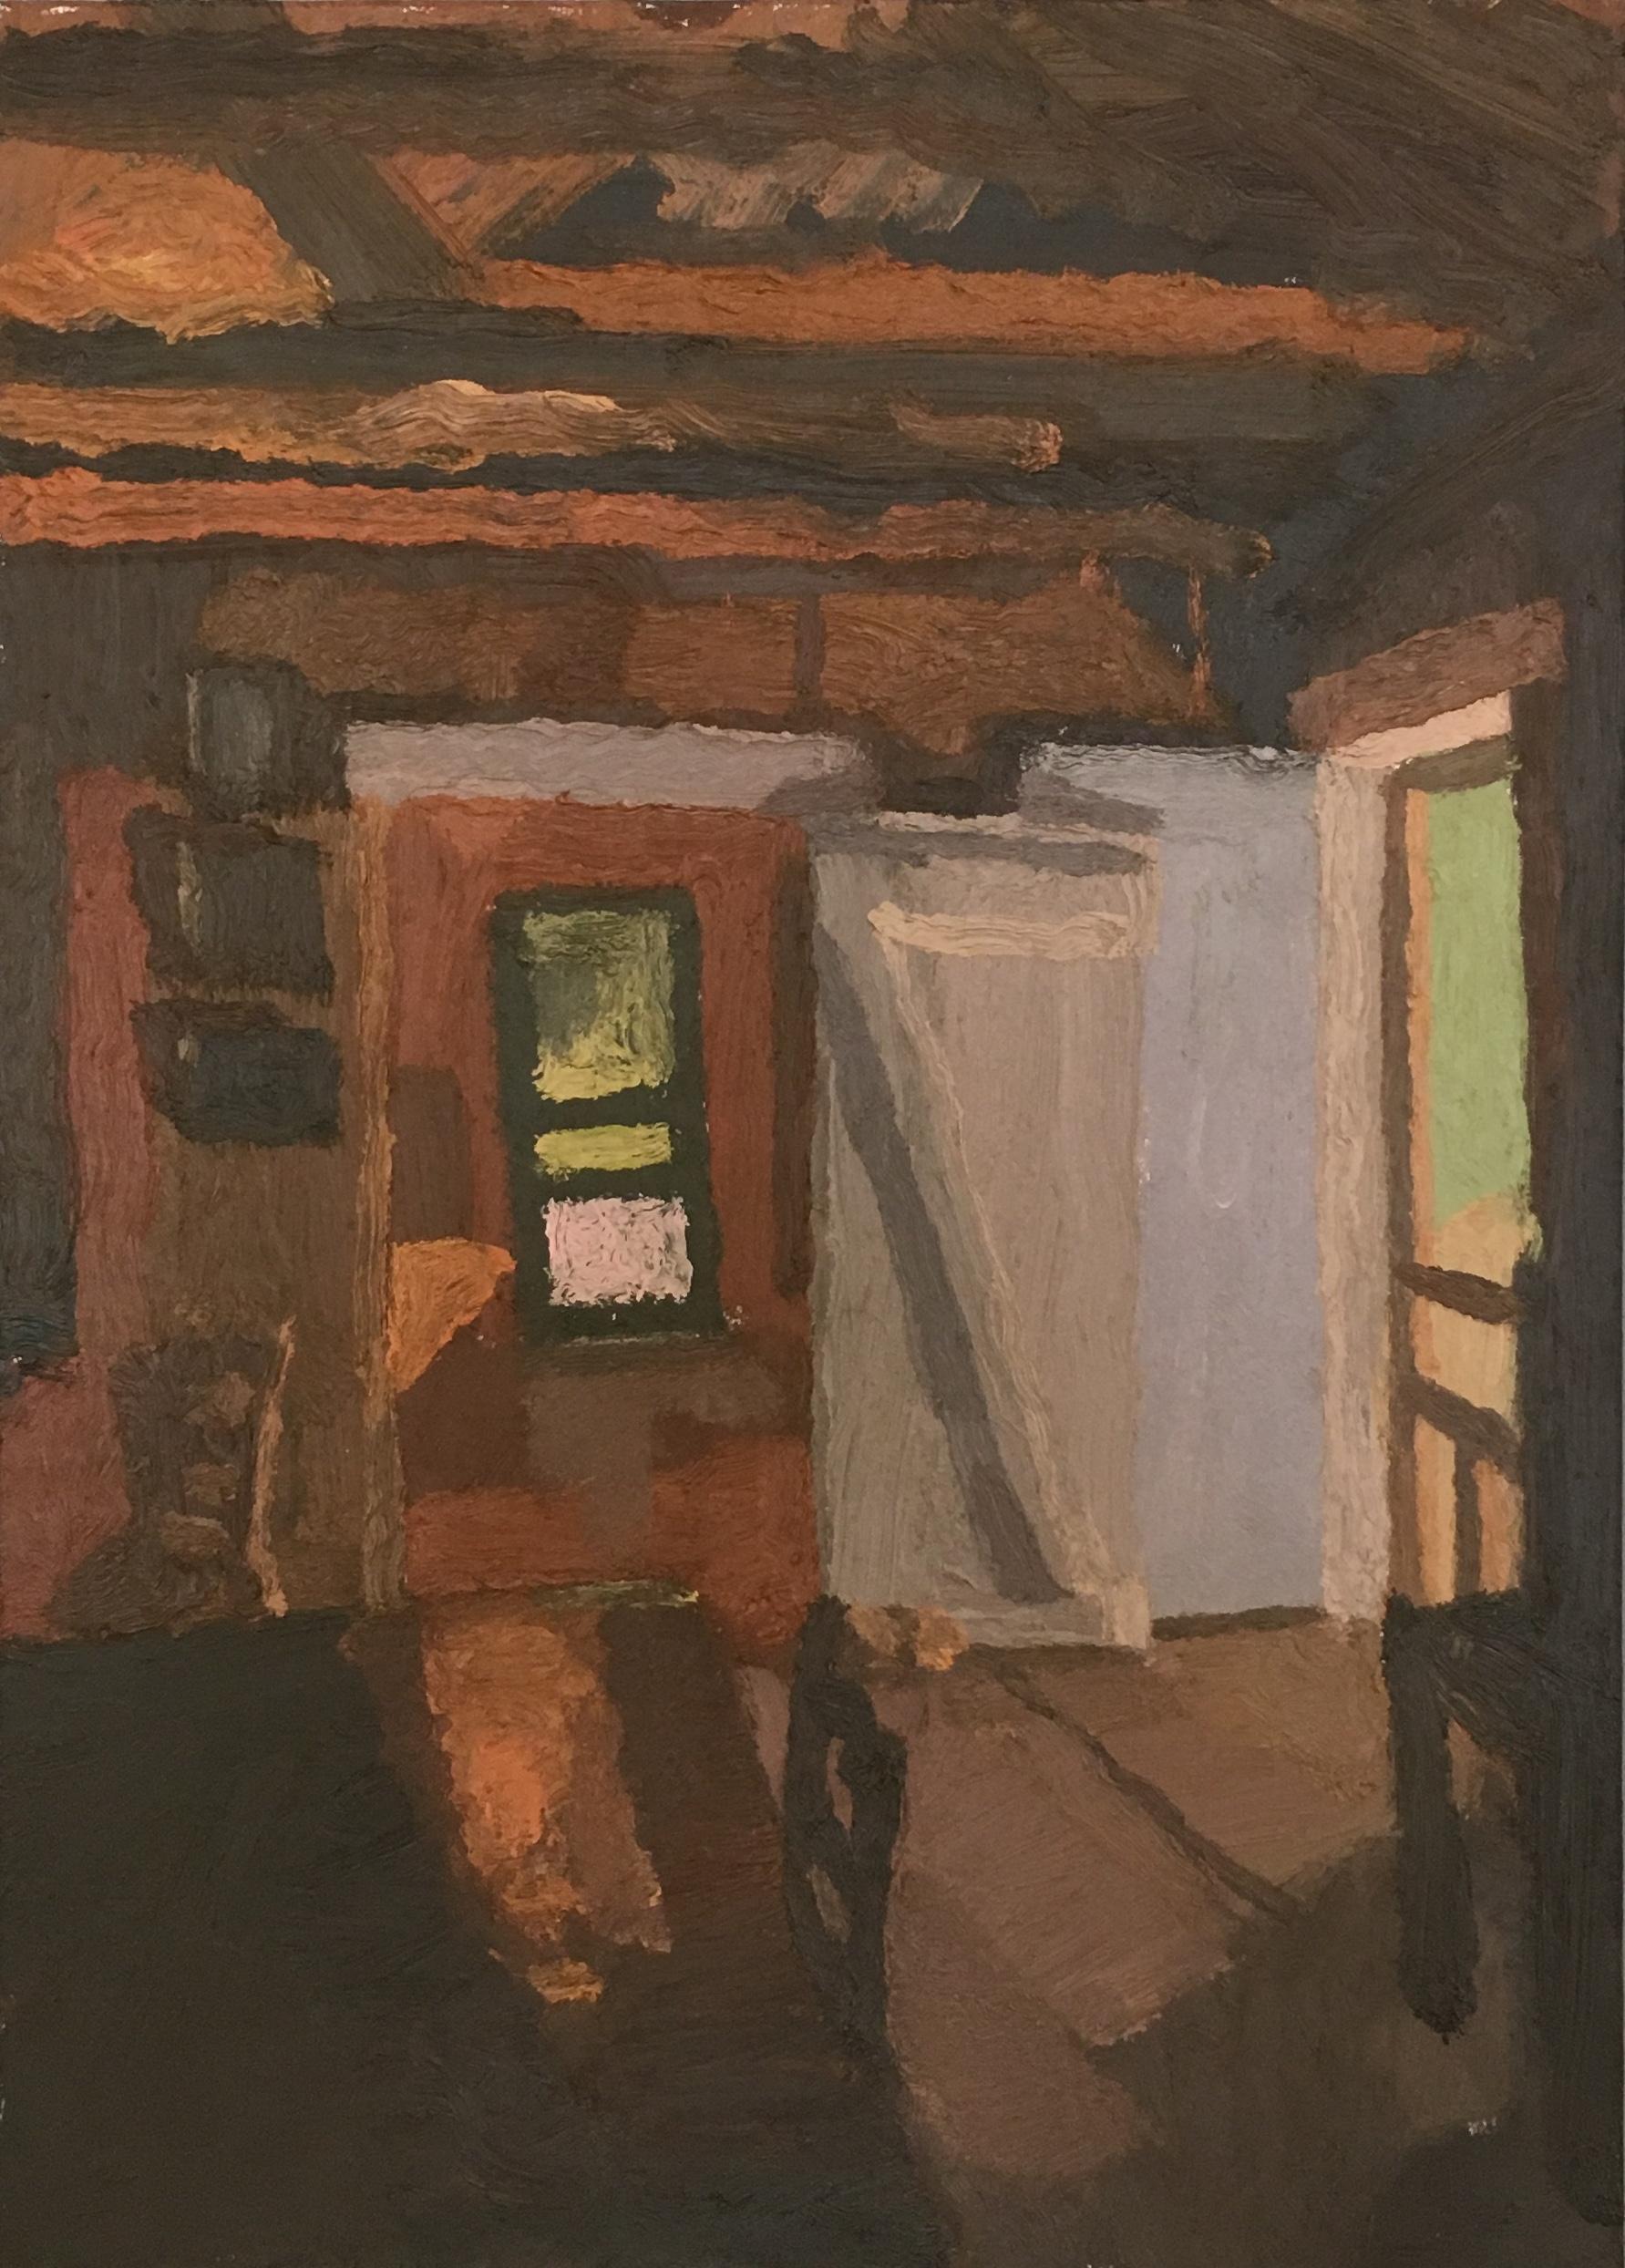 Kitchen House at Hiddenwell